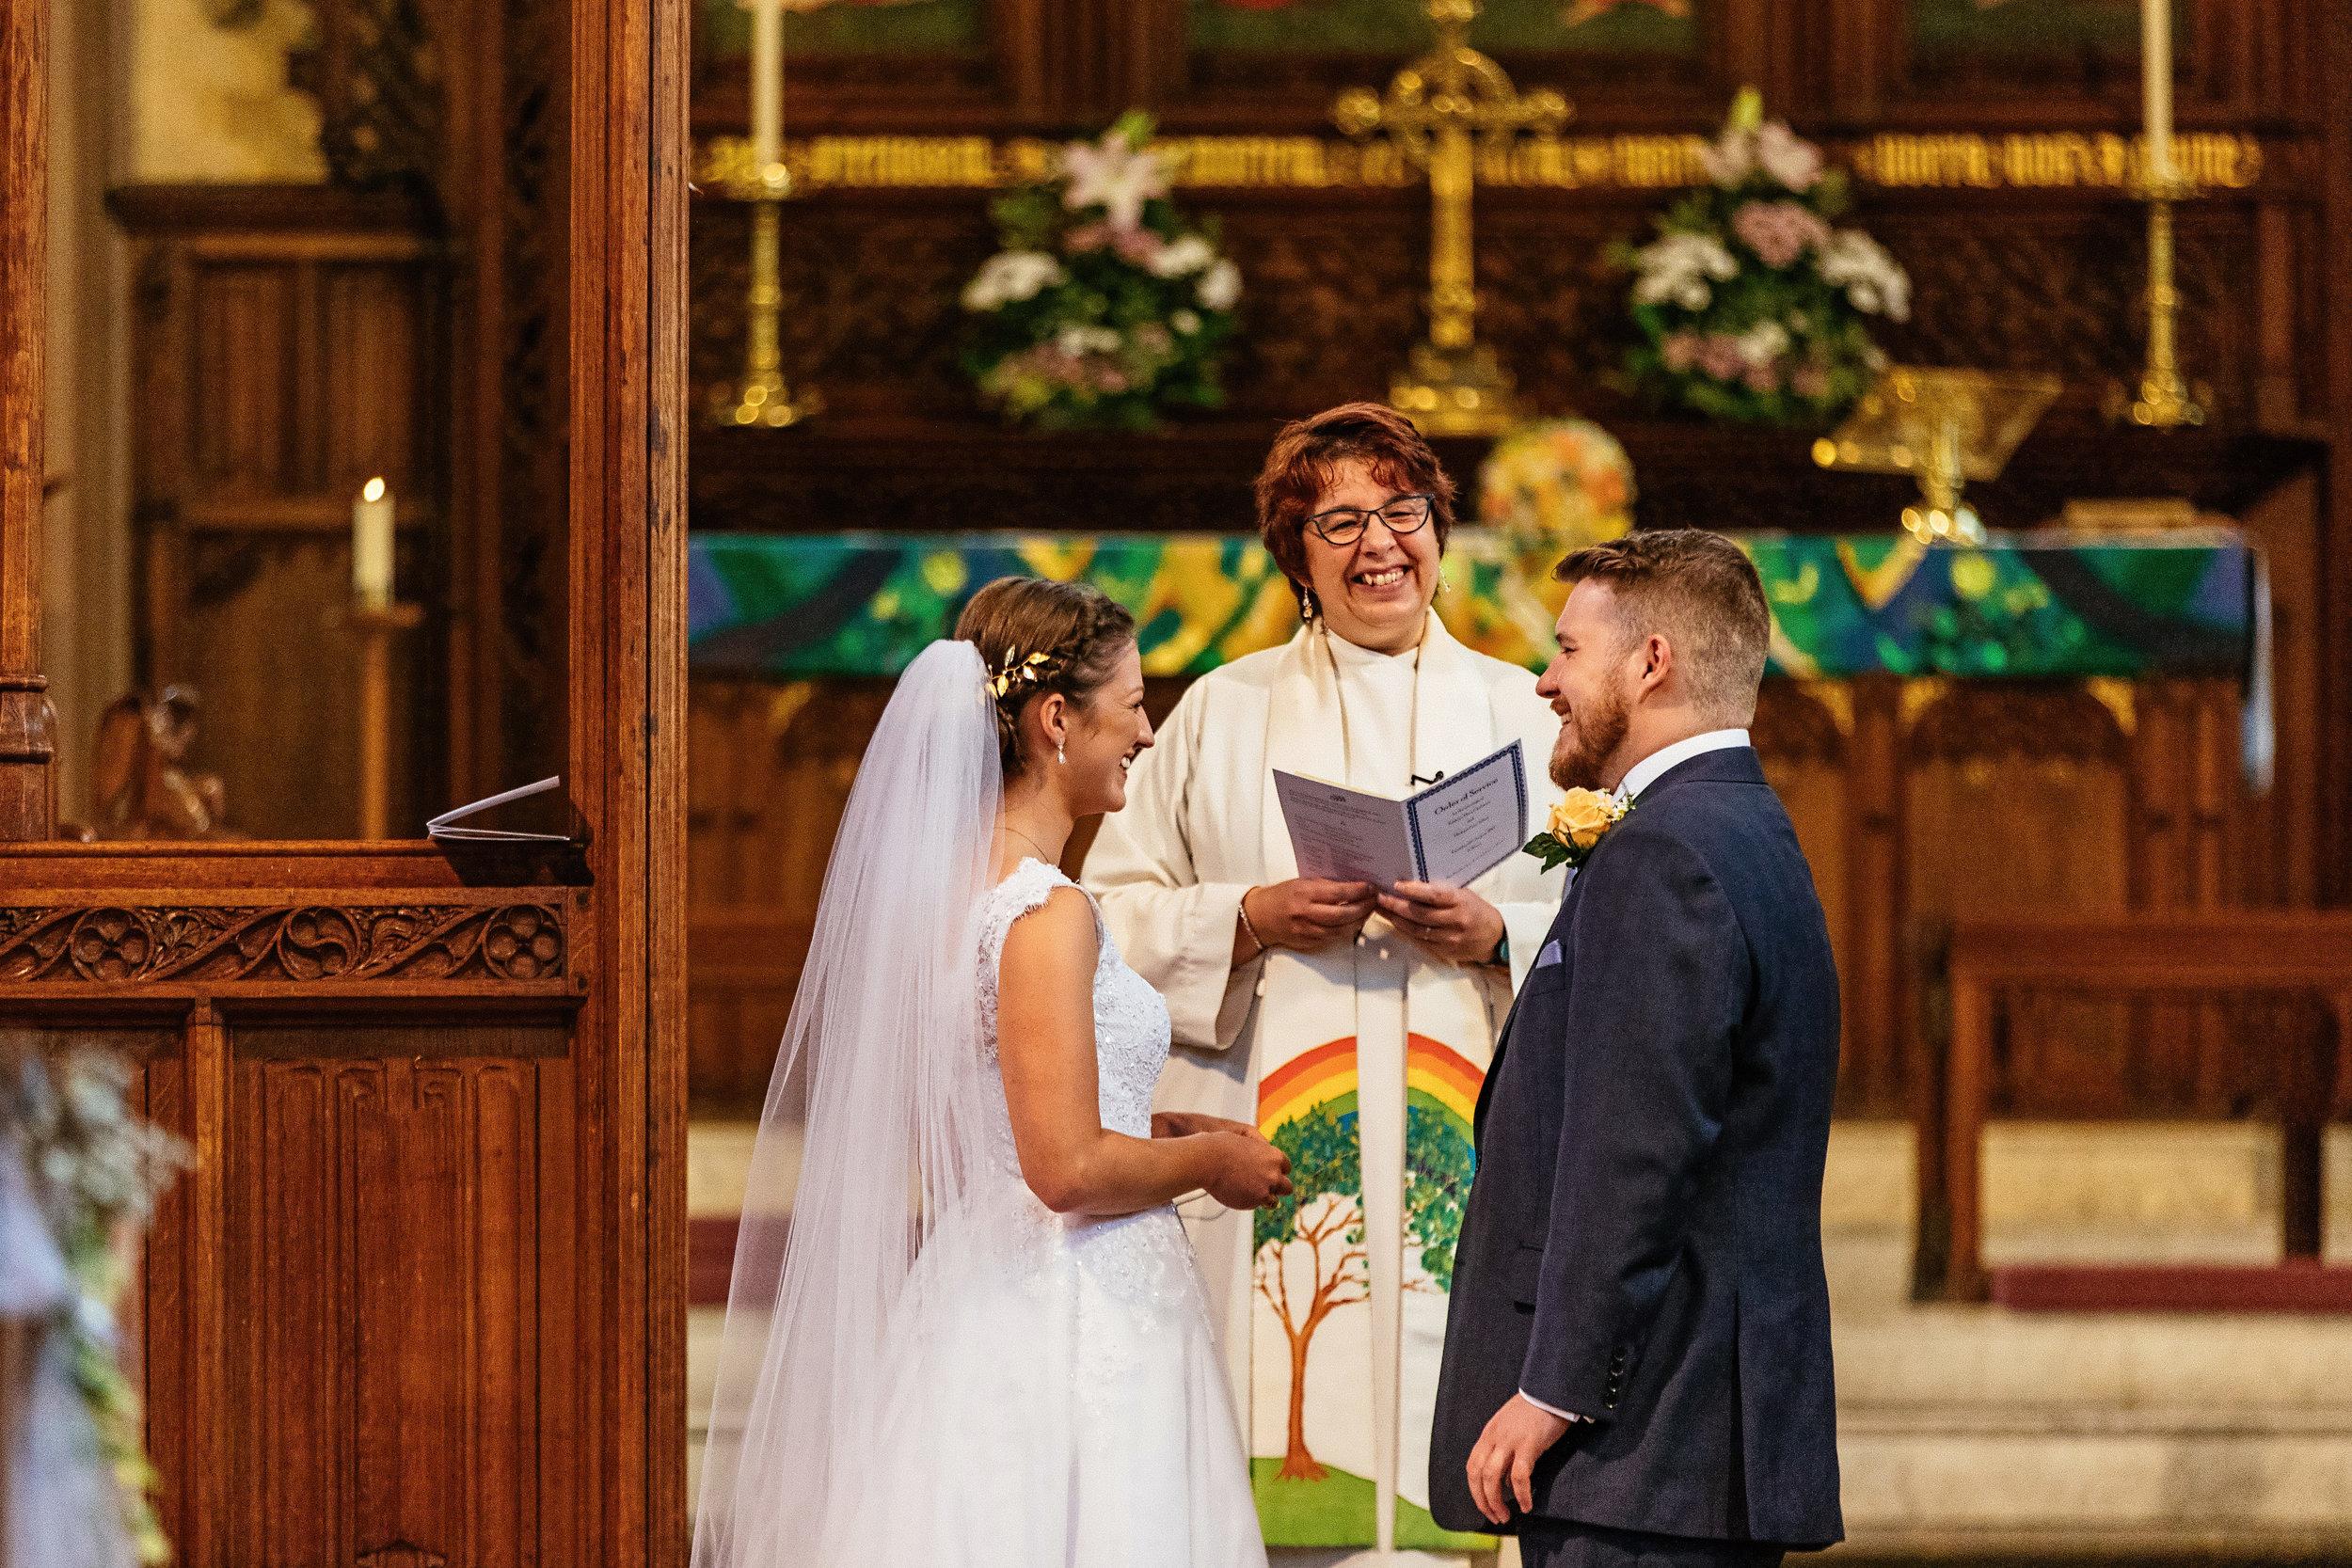 Kathryn-and-Mike-Wedding-Highlights-27.jpg